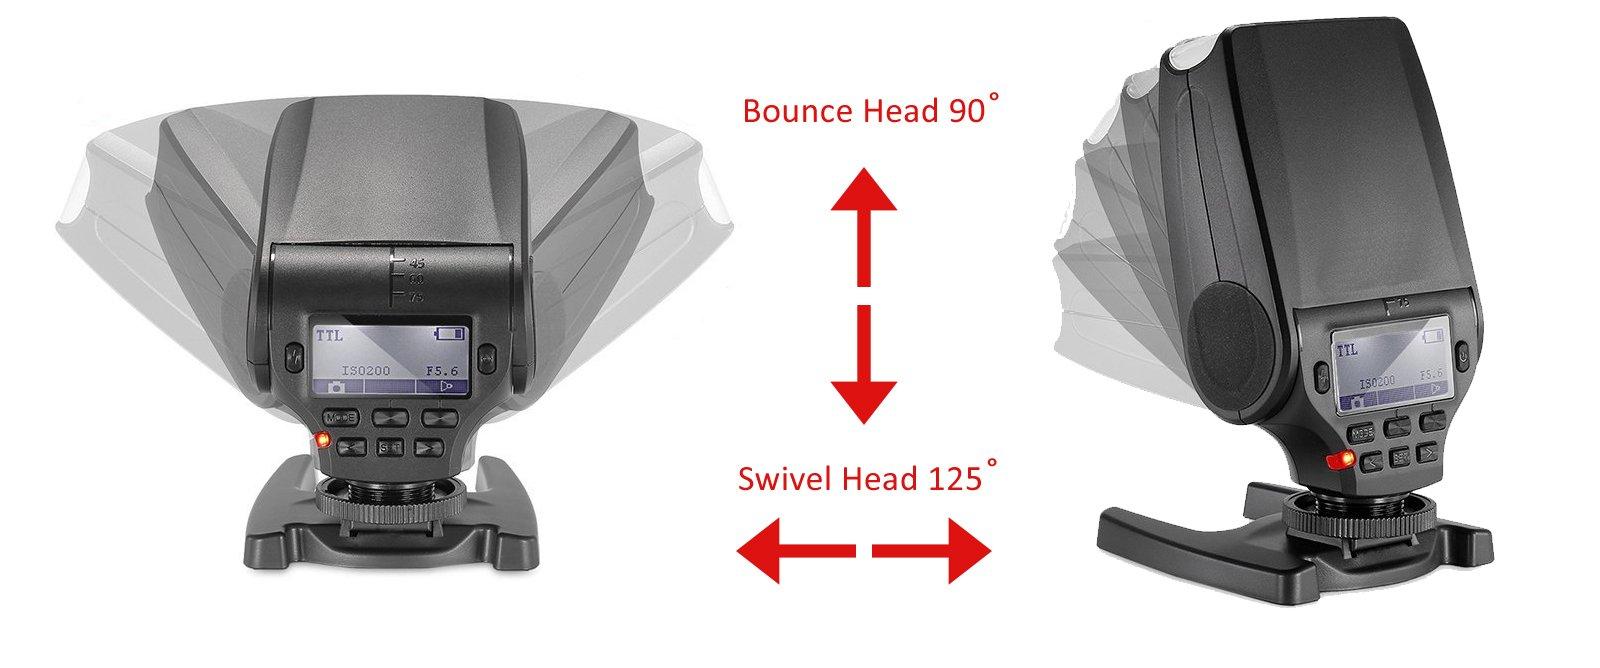 Fujifilm FinePix HS50EXR Bounce, Swivel Head Compact Flash (TTL) + Nw Direct Micro Fiber Cleaning Cloth by Vivitar/Digital (Image #2)